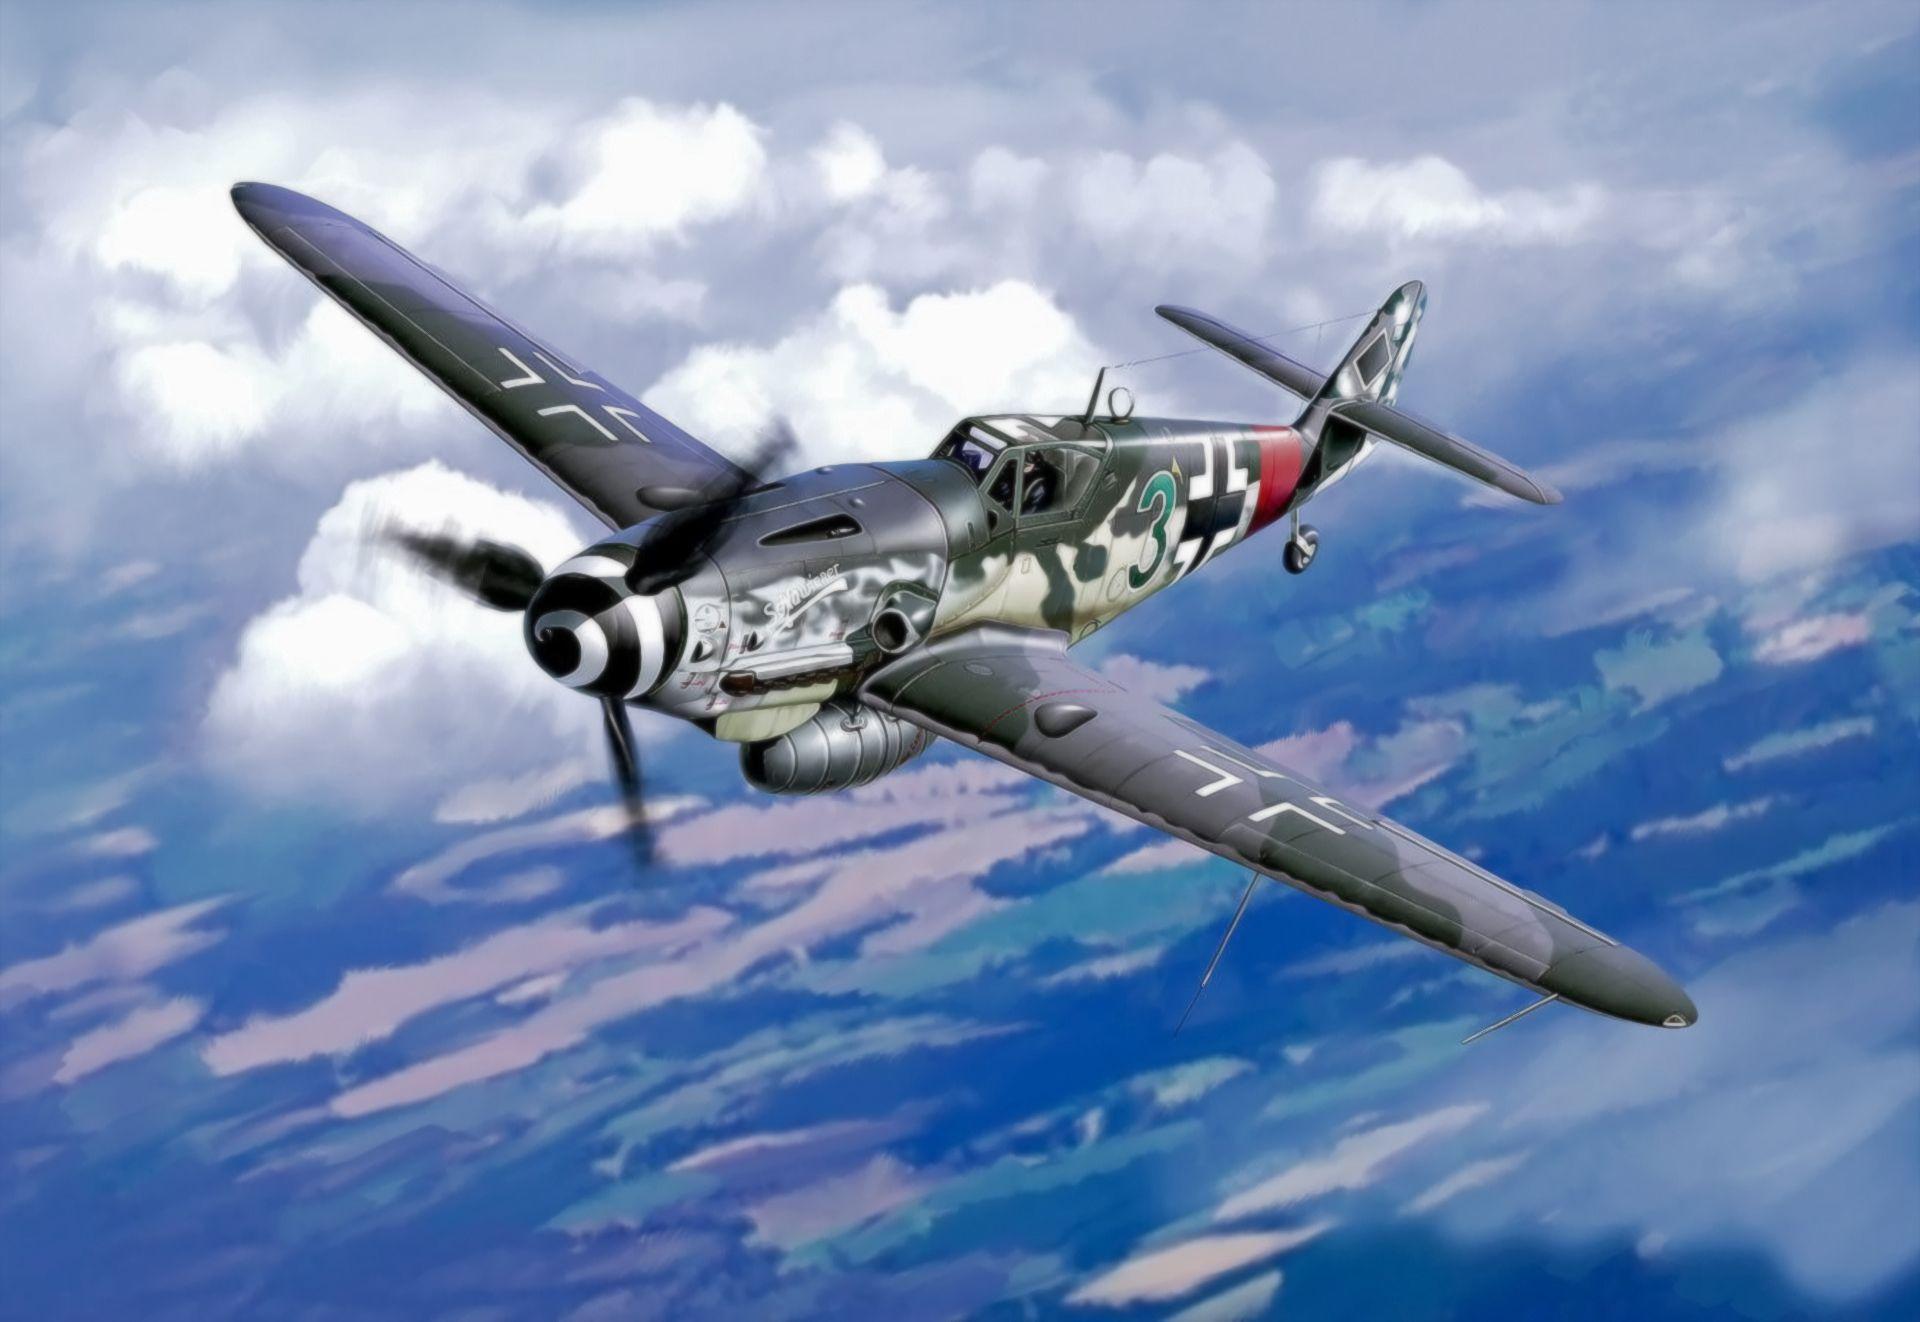 Обои Bf 109 k4, war, painting, german fighter, ww2, aviation. Авиация foto 10